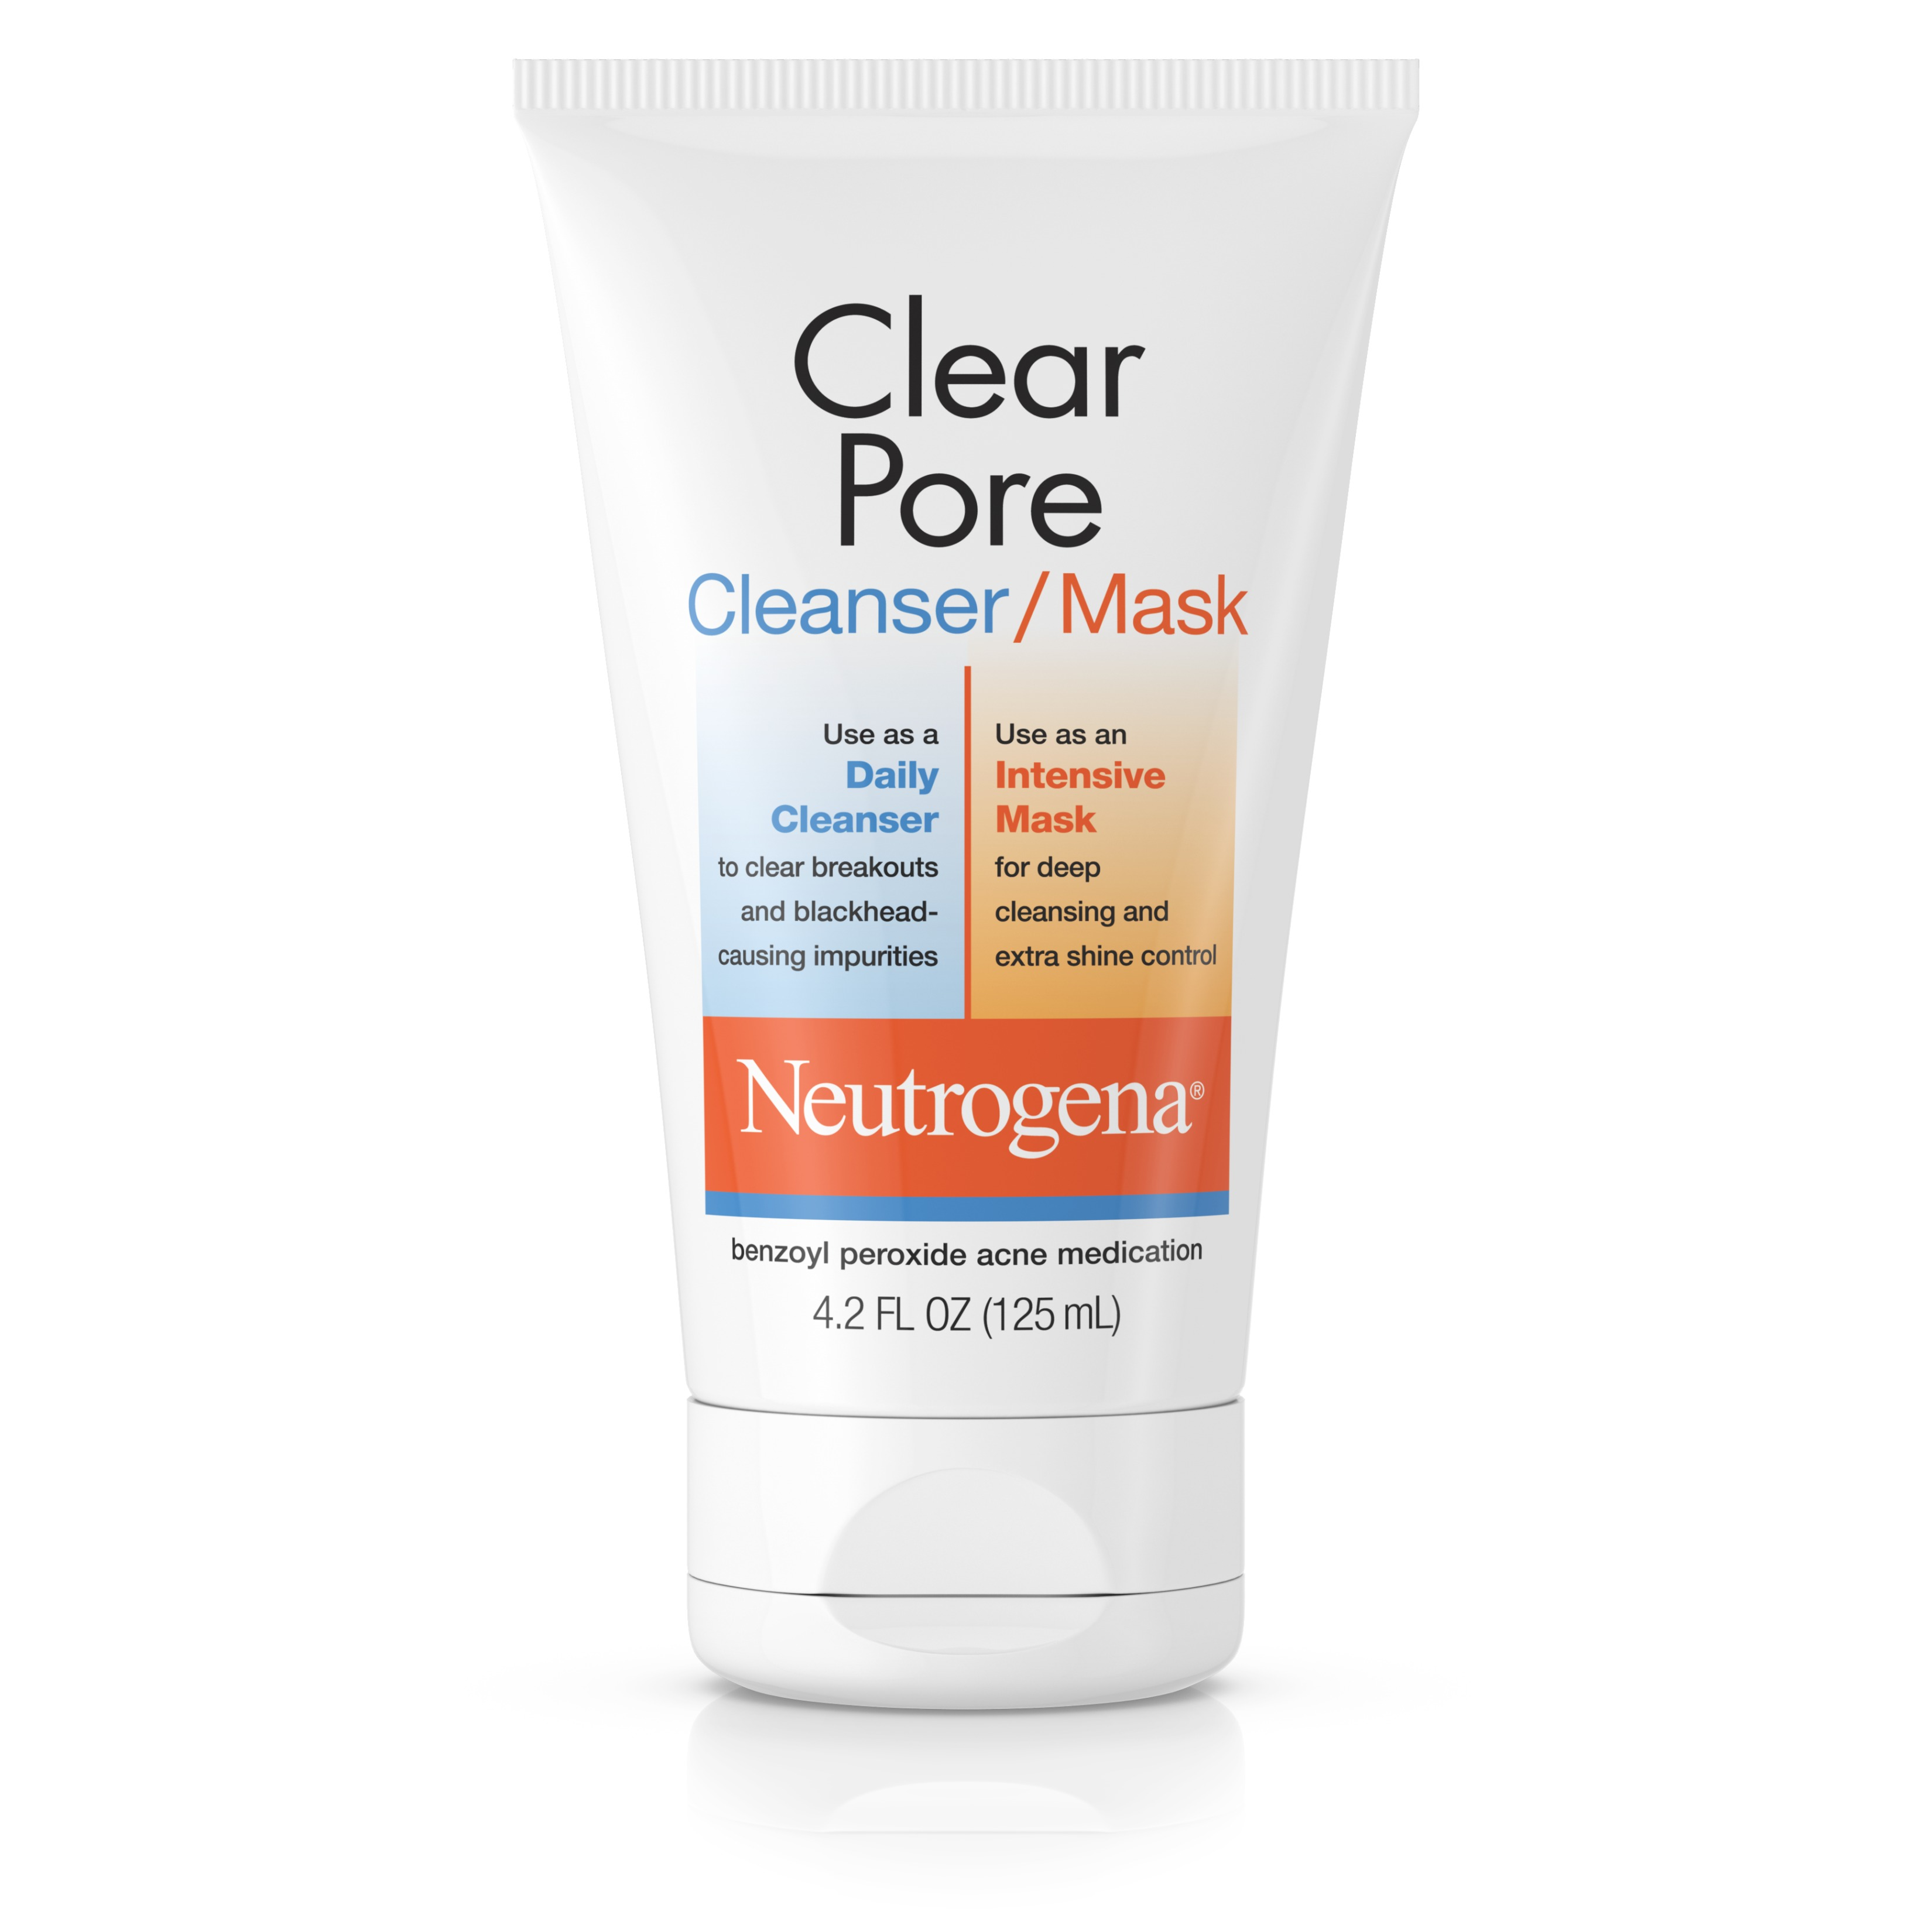 Neutrogena Clear Pore Facial Cleanser / Face Mask, 4.2 fl. oz